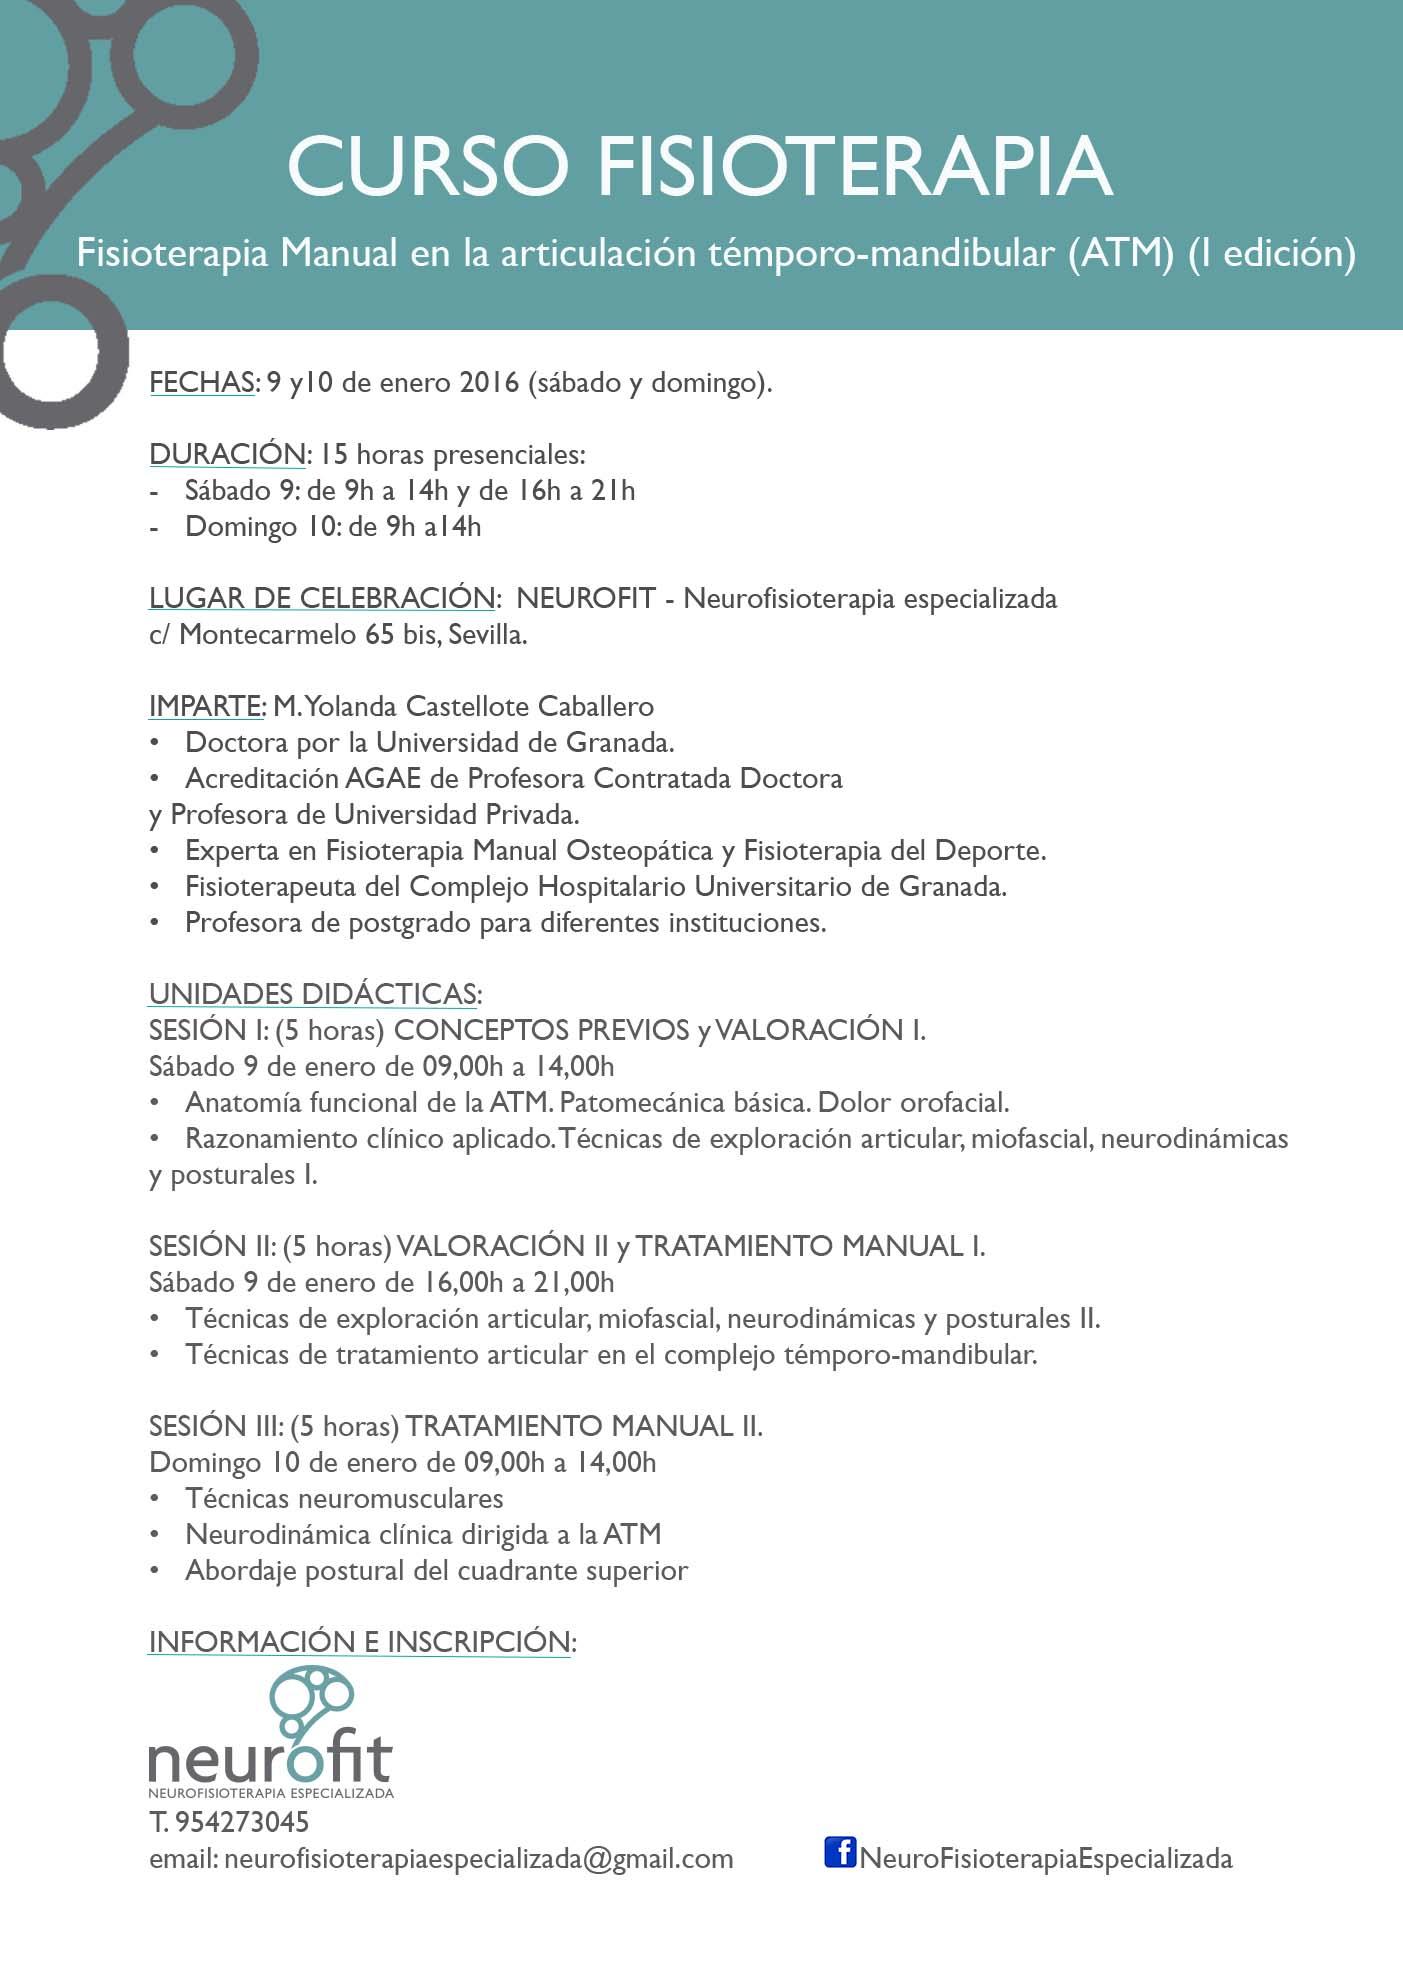 Fisioterapia Manual en la Articulación Temporo-mandibular (ATM) (I edición)